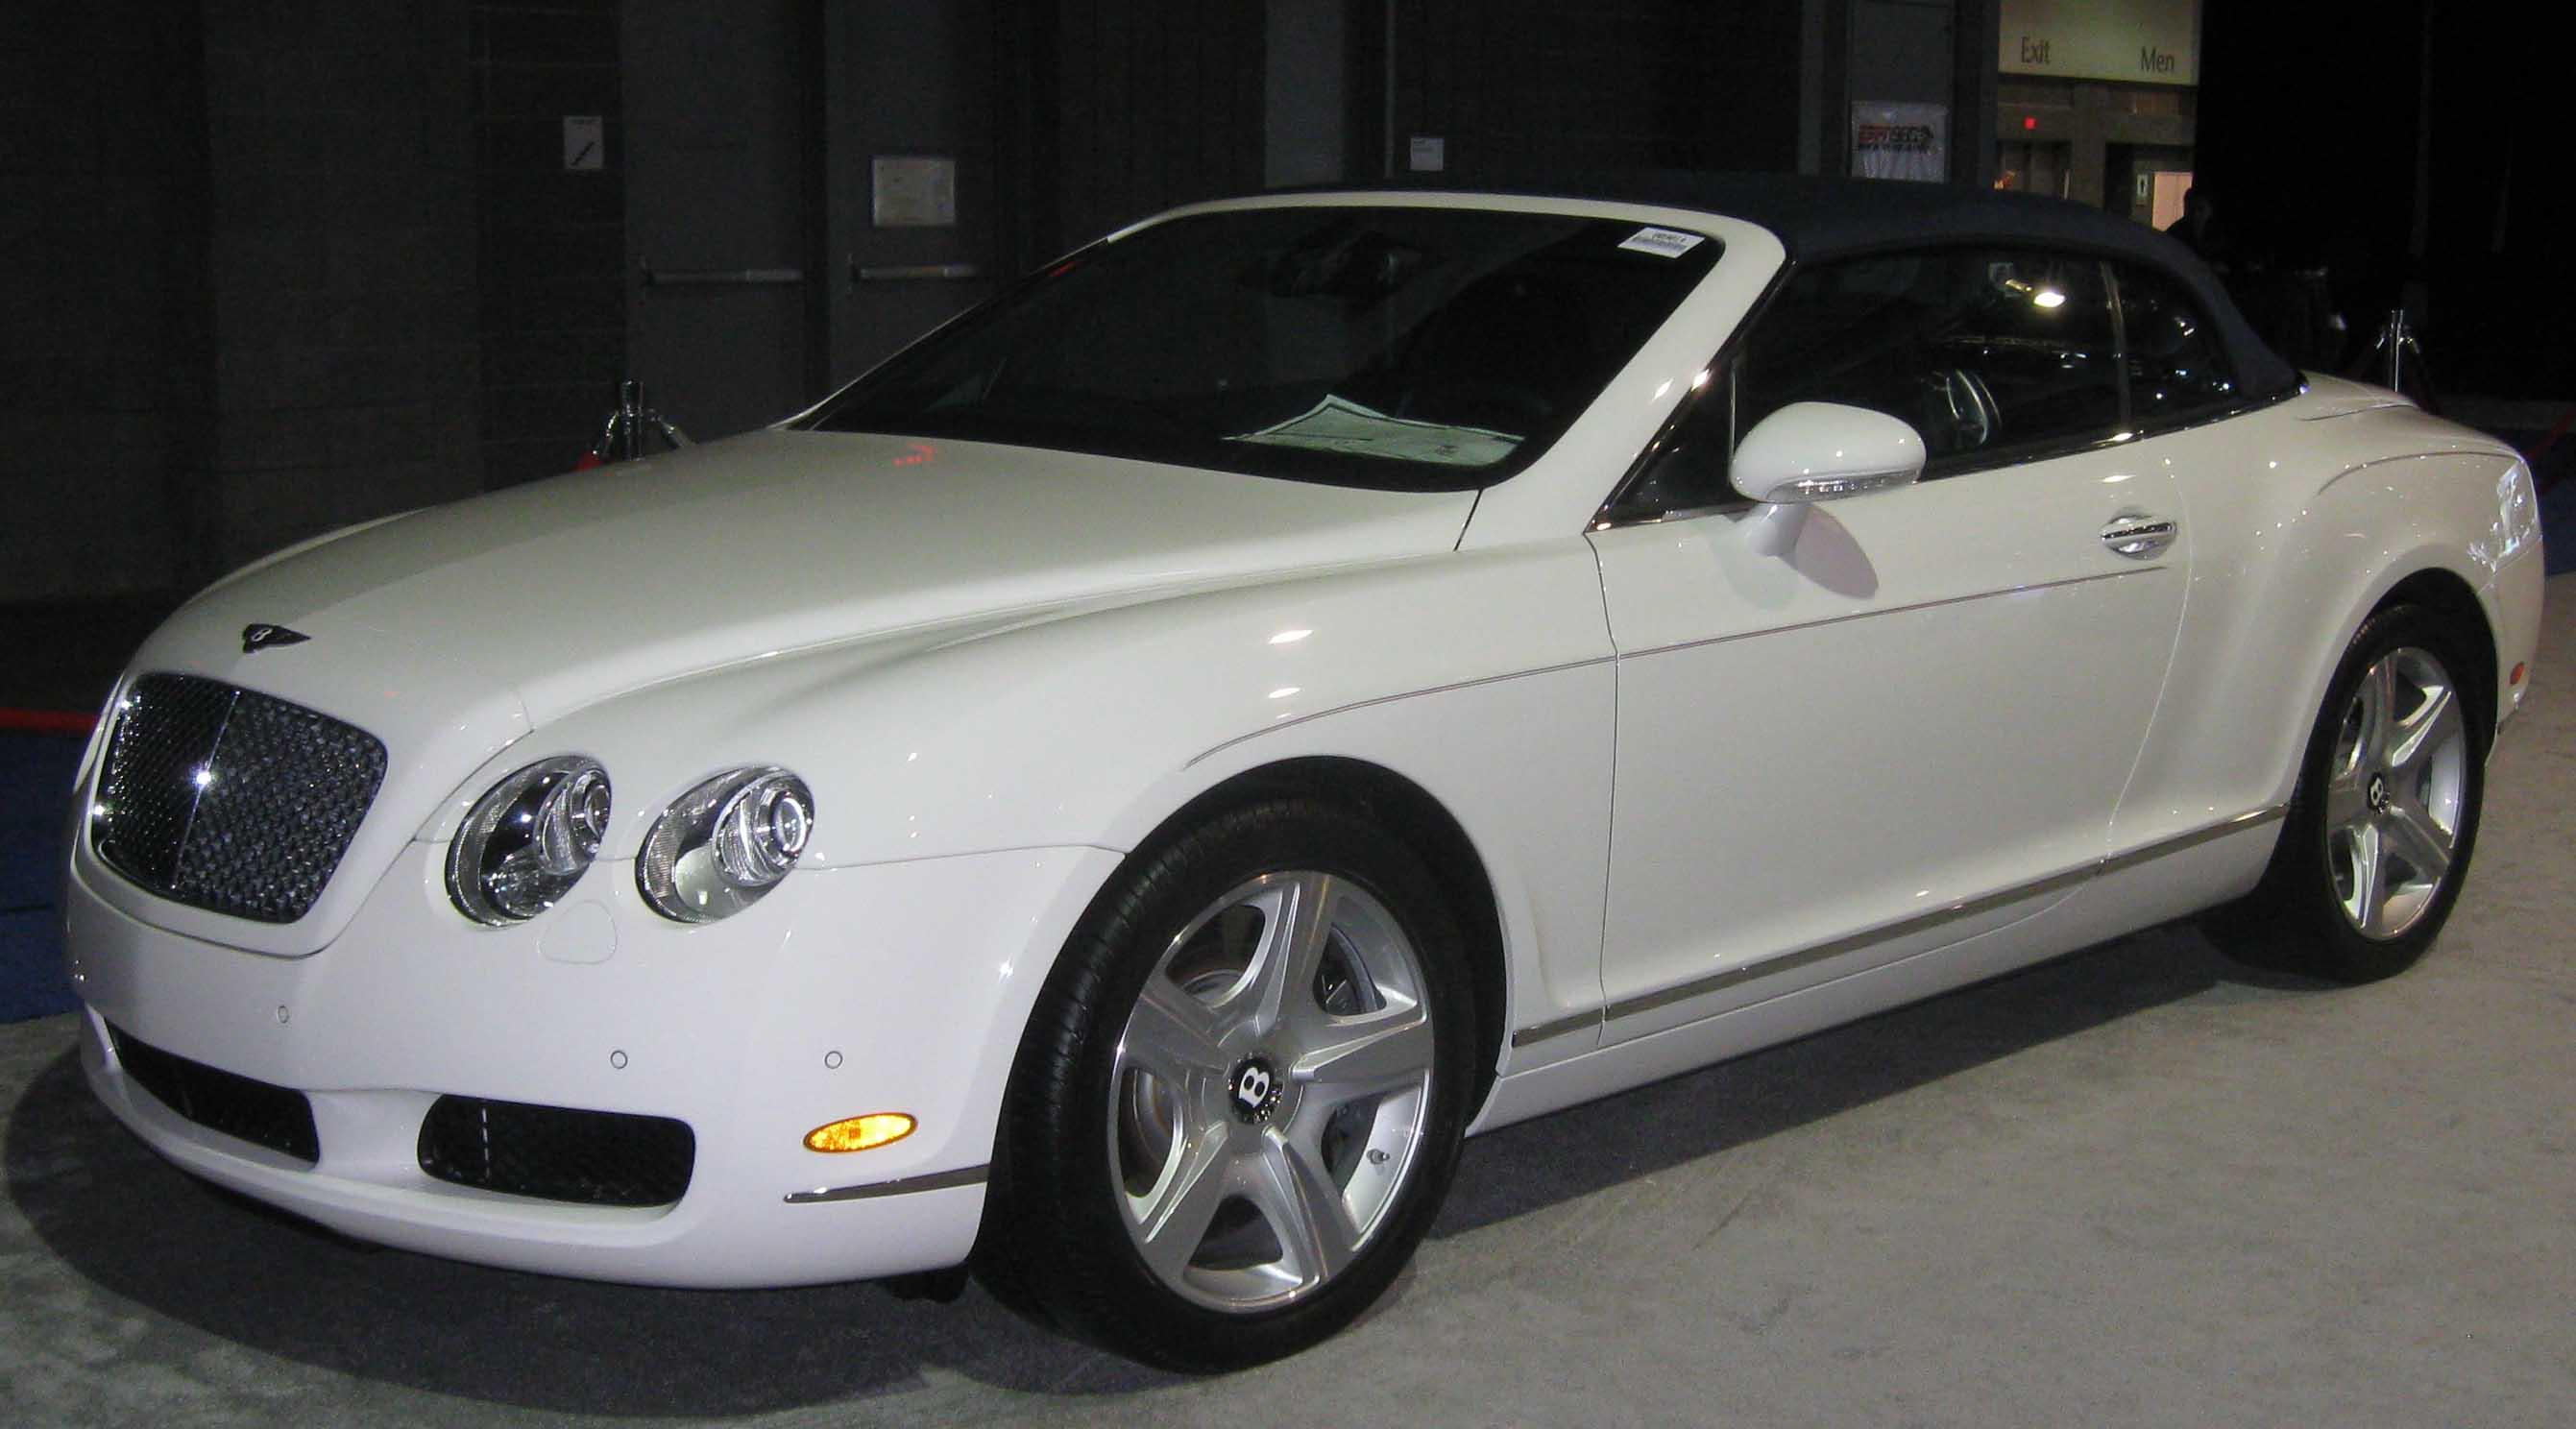 2009 Bentley Continental Gtc Image 2